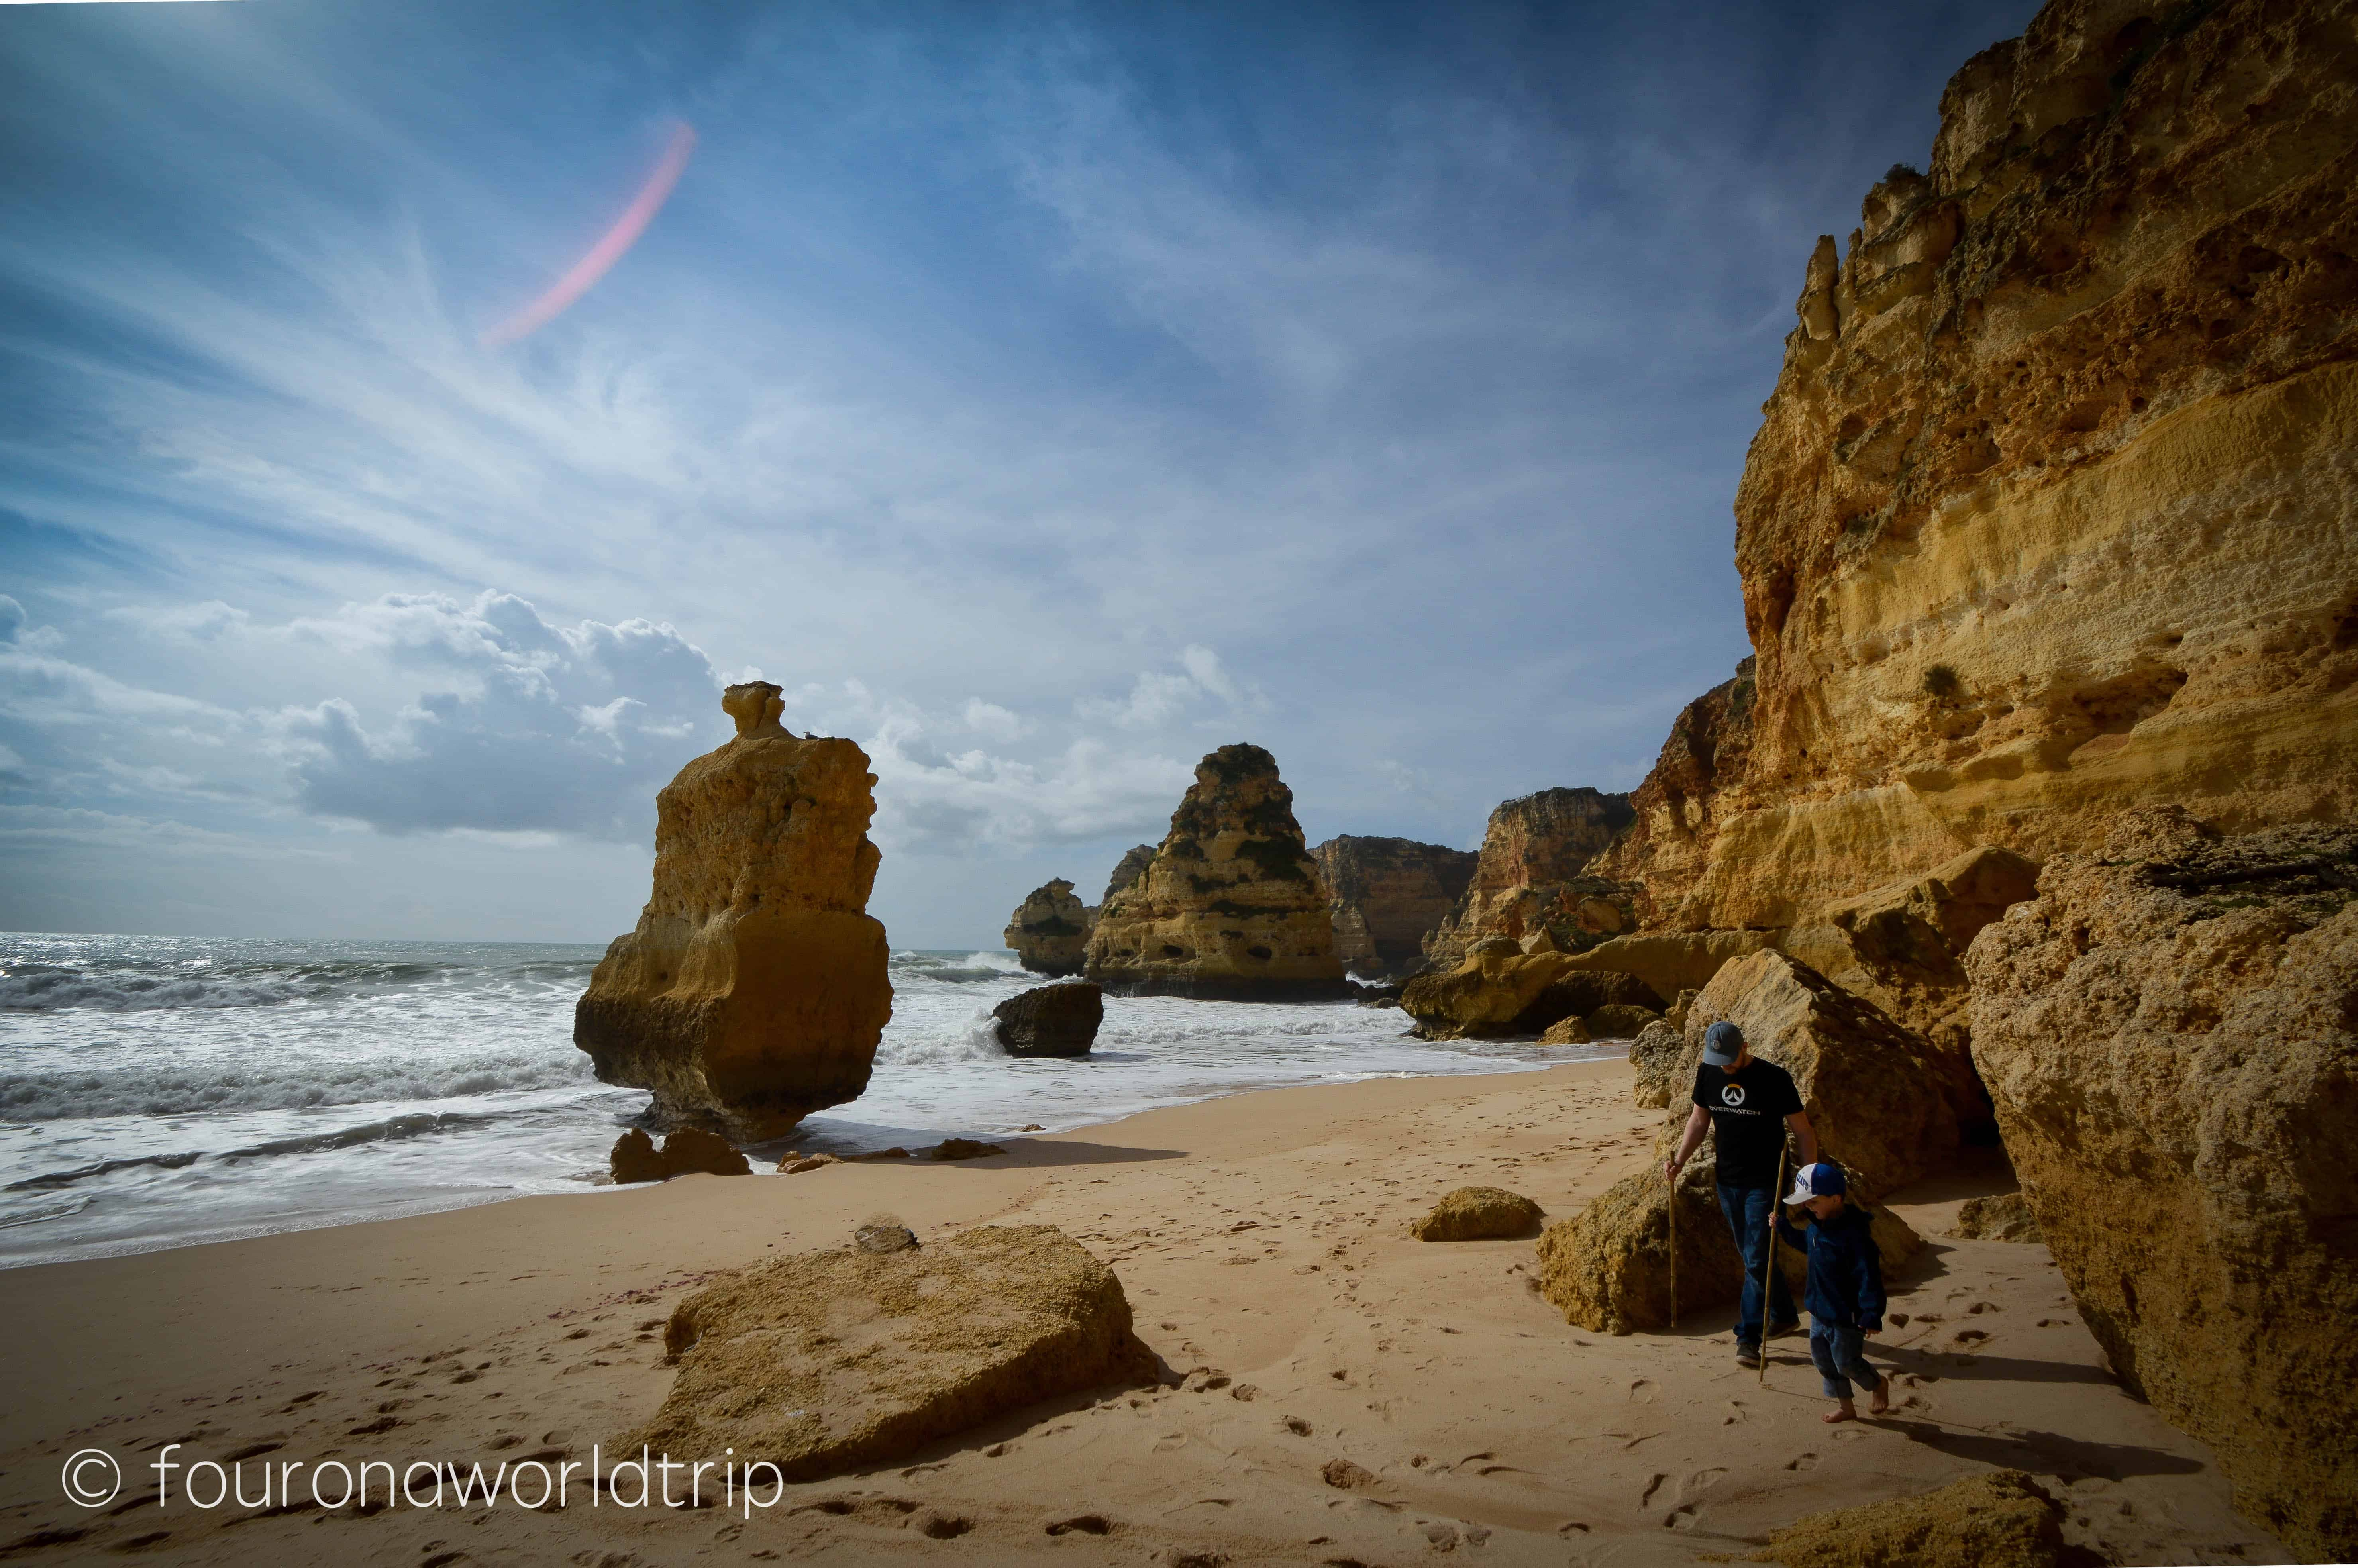 Exploring Praia de Marinha – the most famous rock formations in Algarve